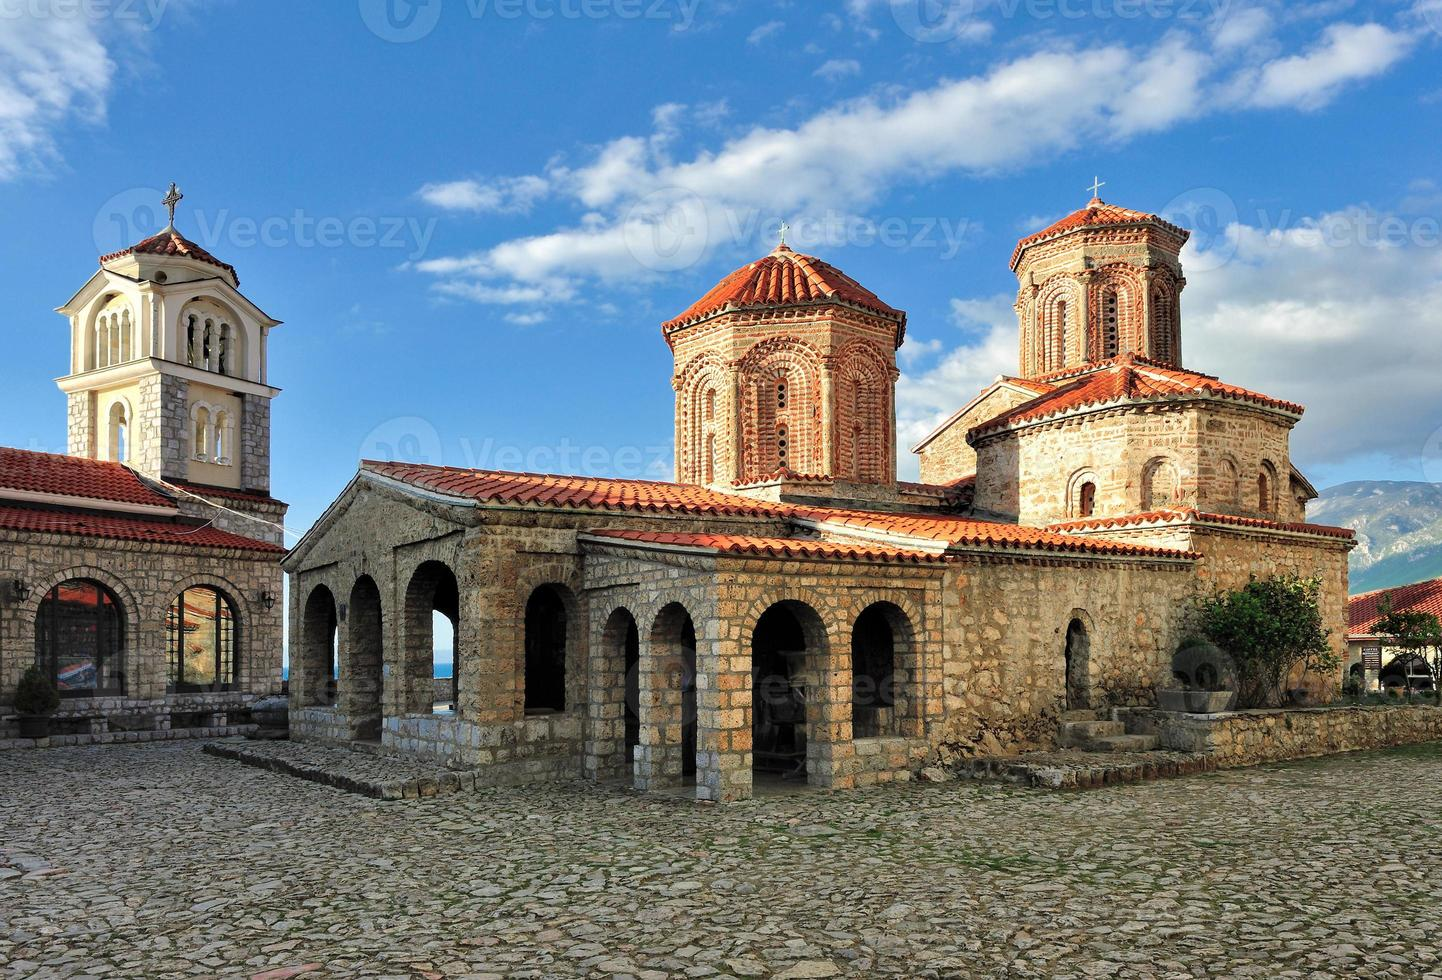 mosteiro de saint naum foto